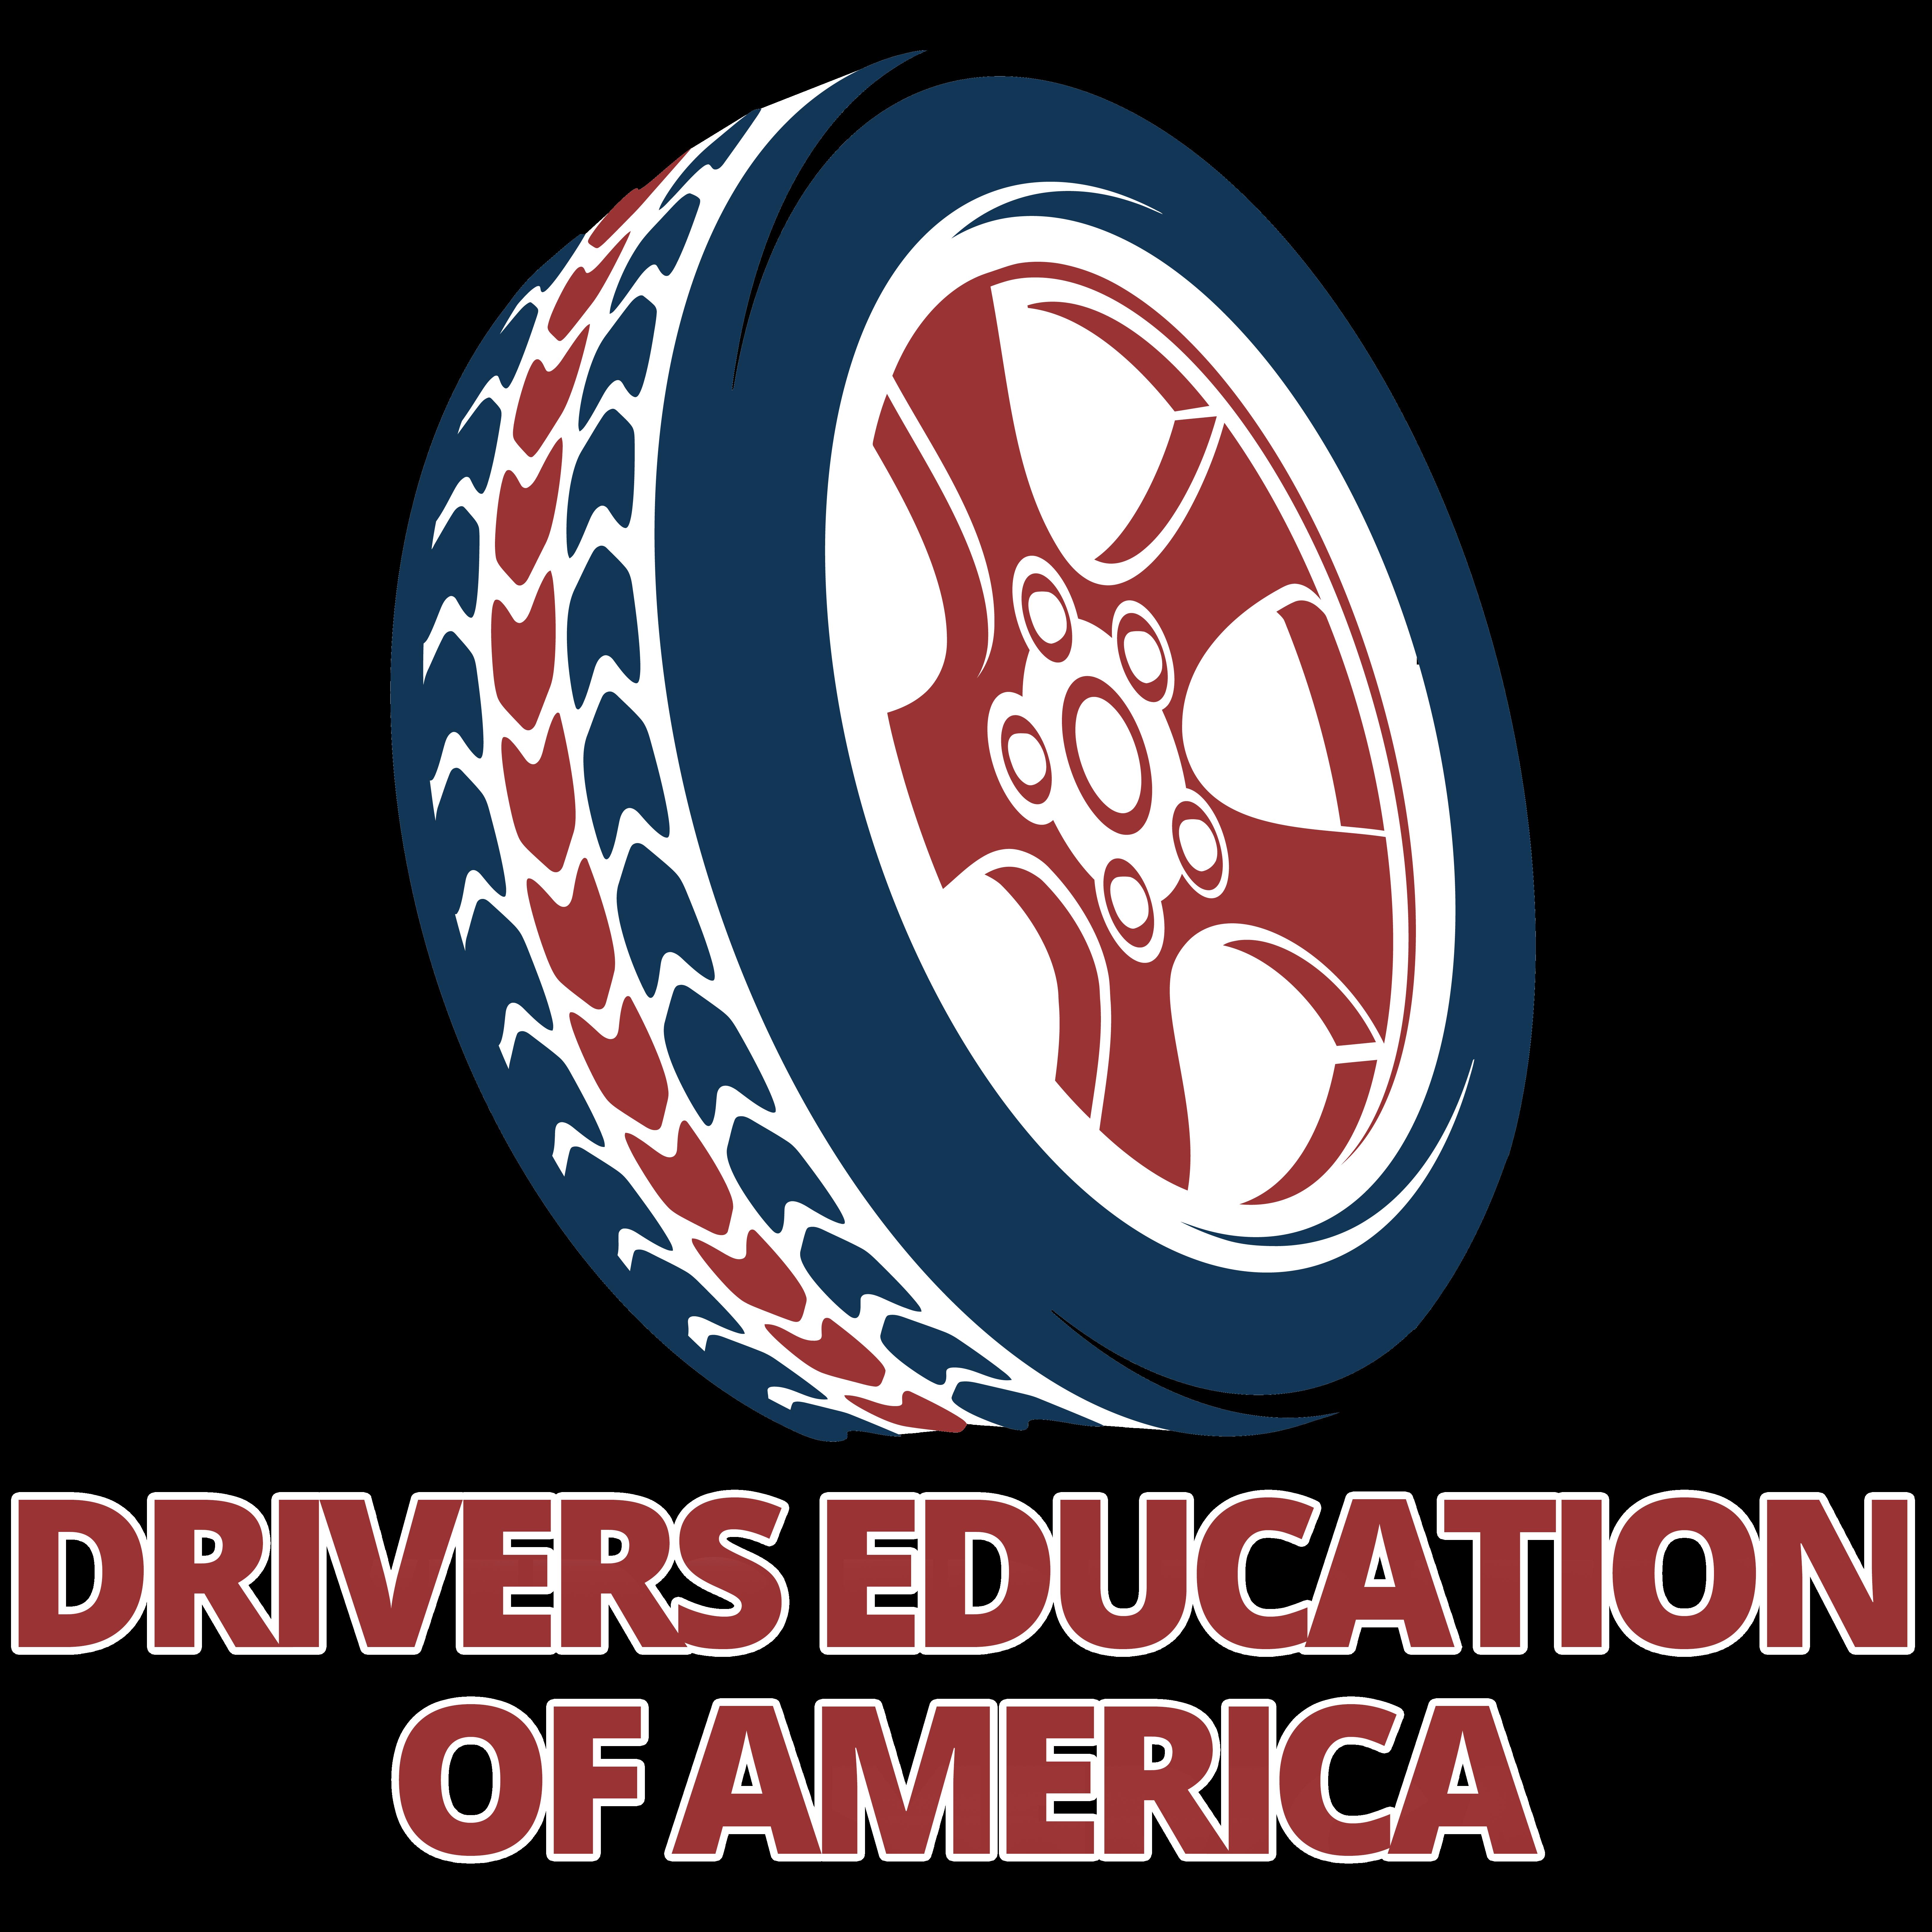 Drivers Education of America - Garland, TX - Driving Schools